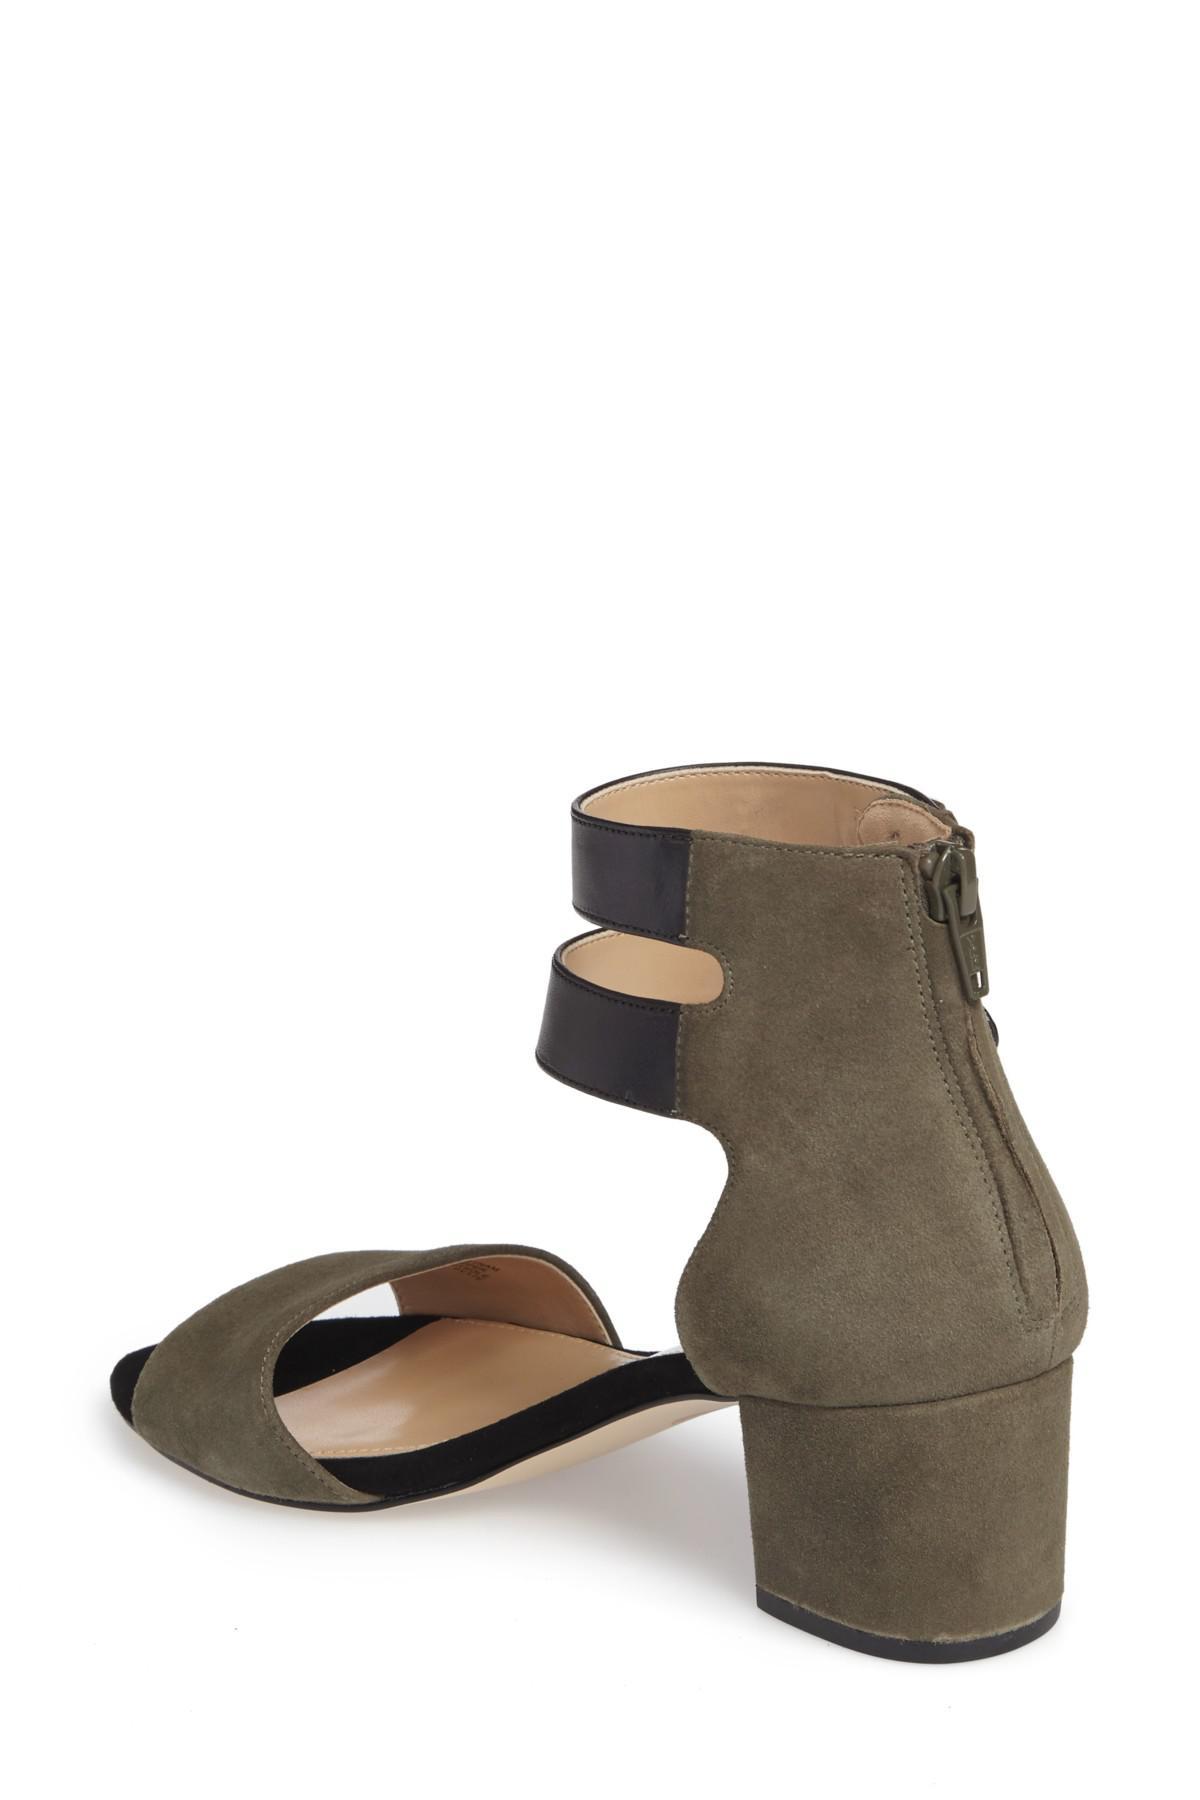 MICHAEL Michael Kors Maisie Sandal Y6L0qRU